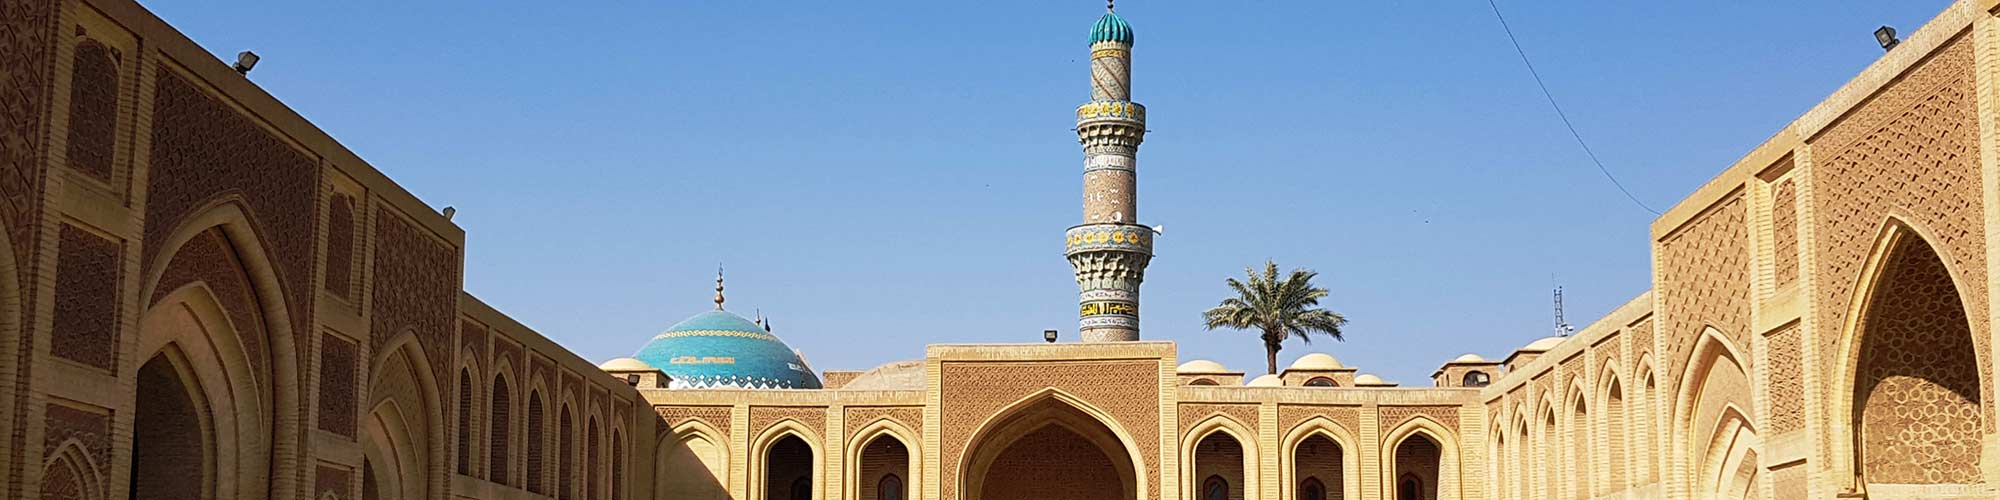 Madrasa Al Mustansiriya- El Pais Viajes